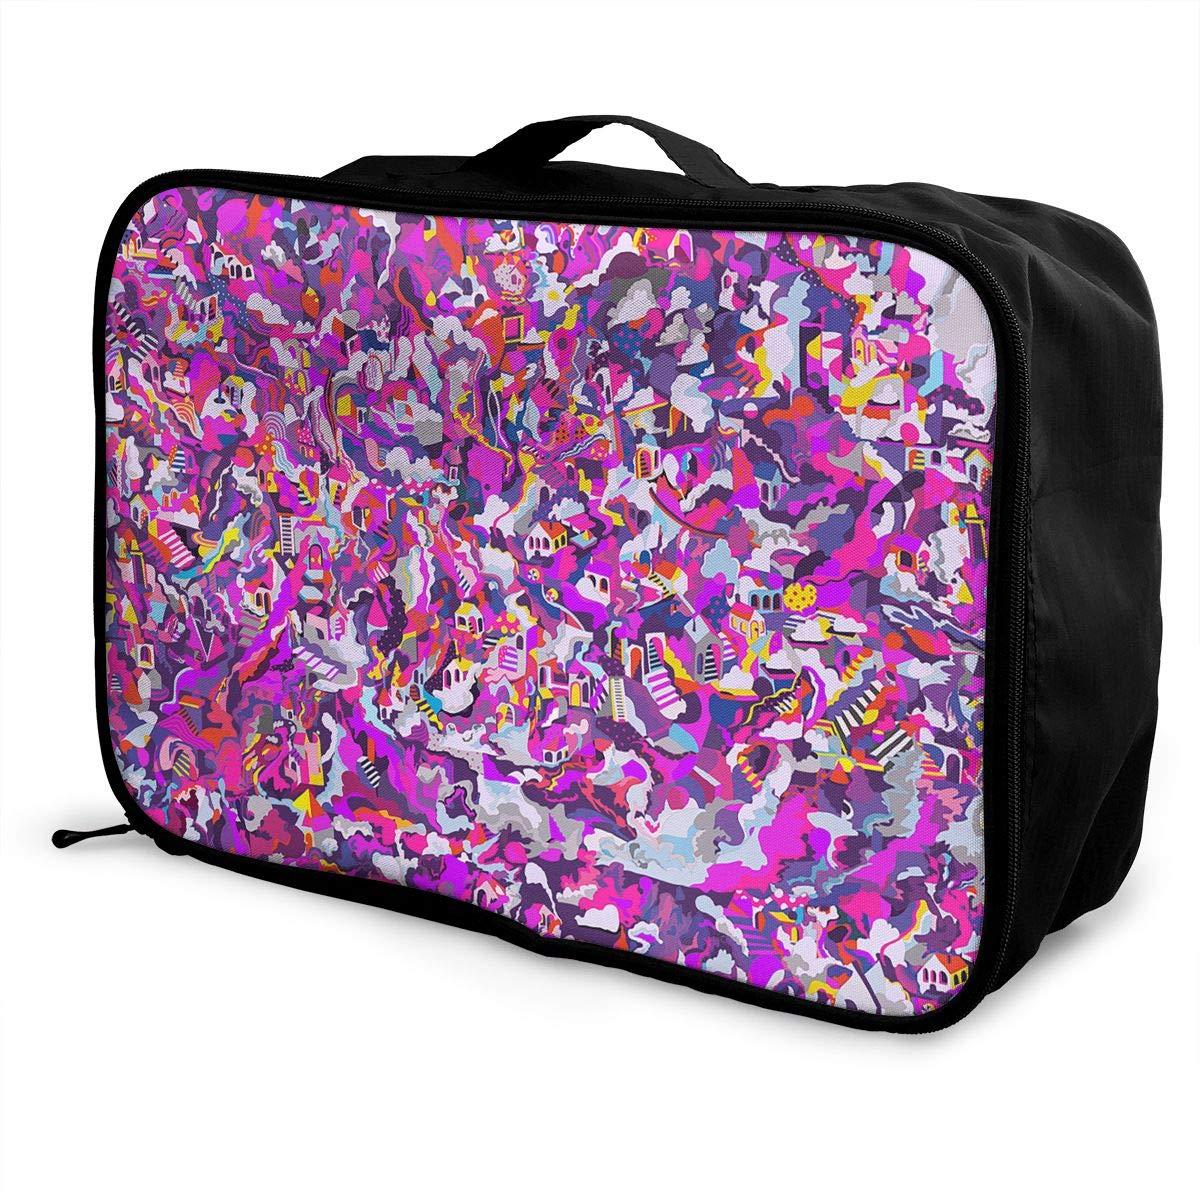 Travel Luggage Duffle Bag Lightweight Portable Handbag Abstract Art Pattern Large Capacity Waterproof Foldable Storage Tote